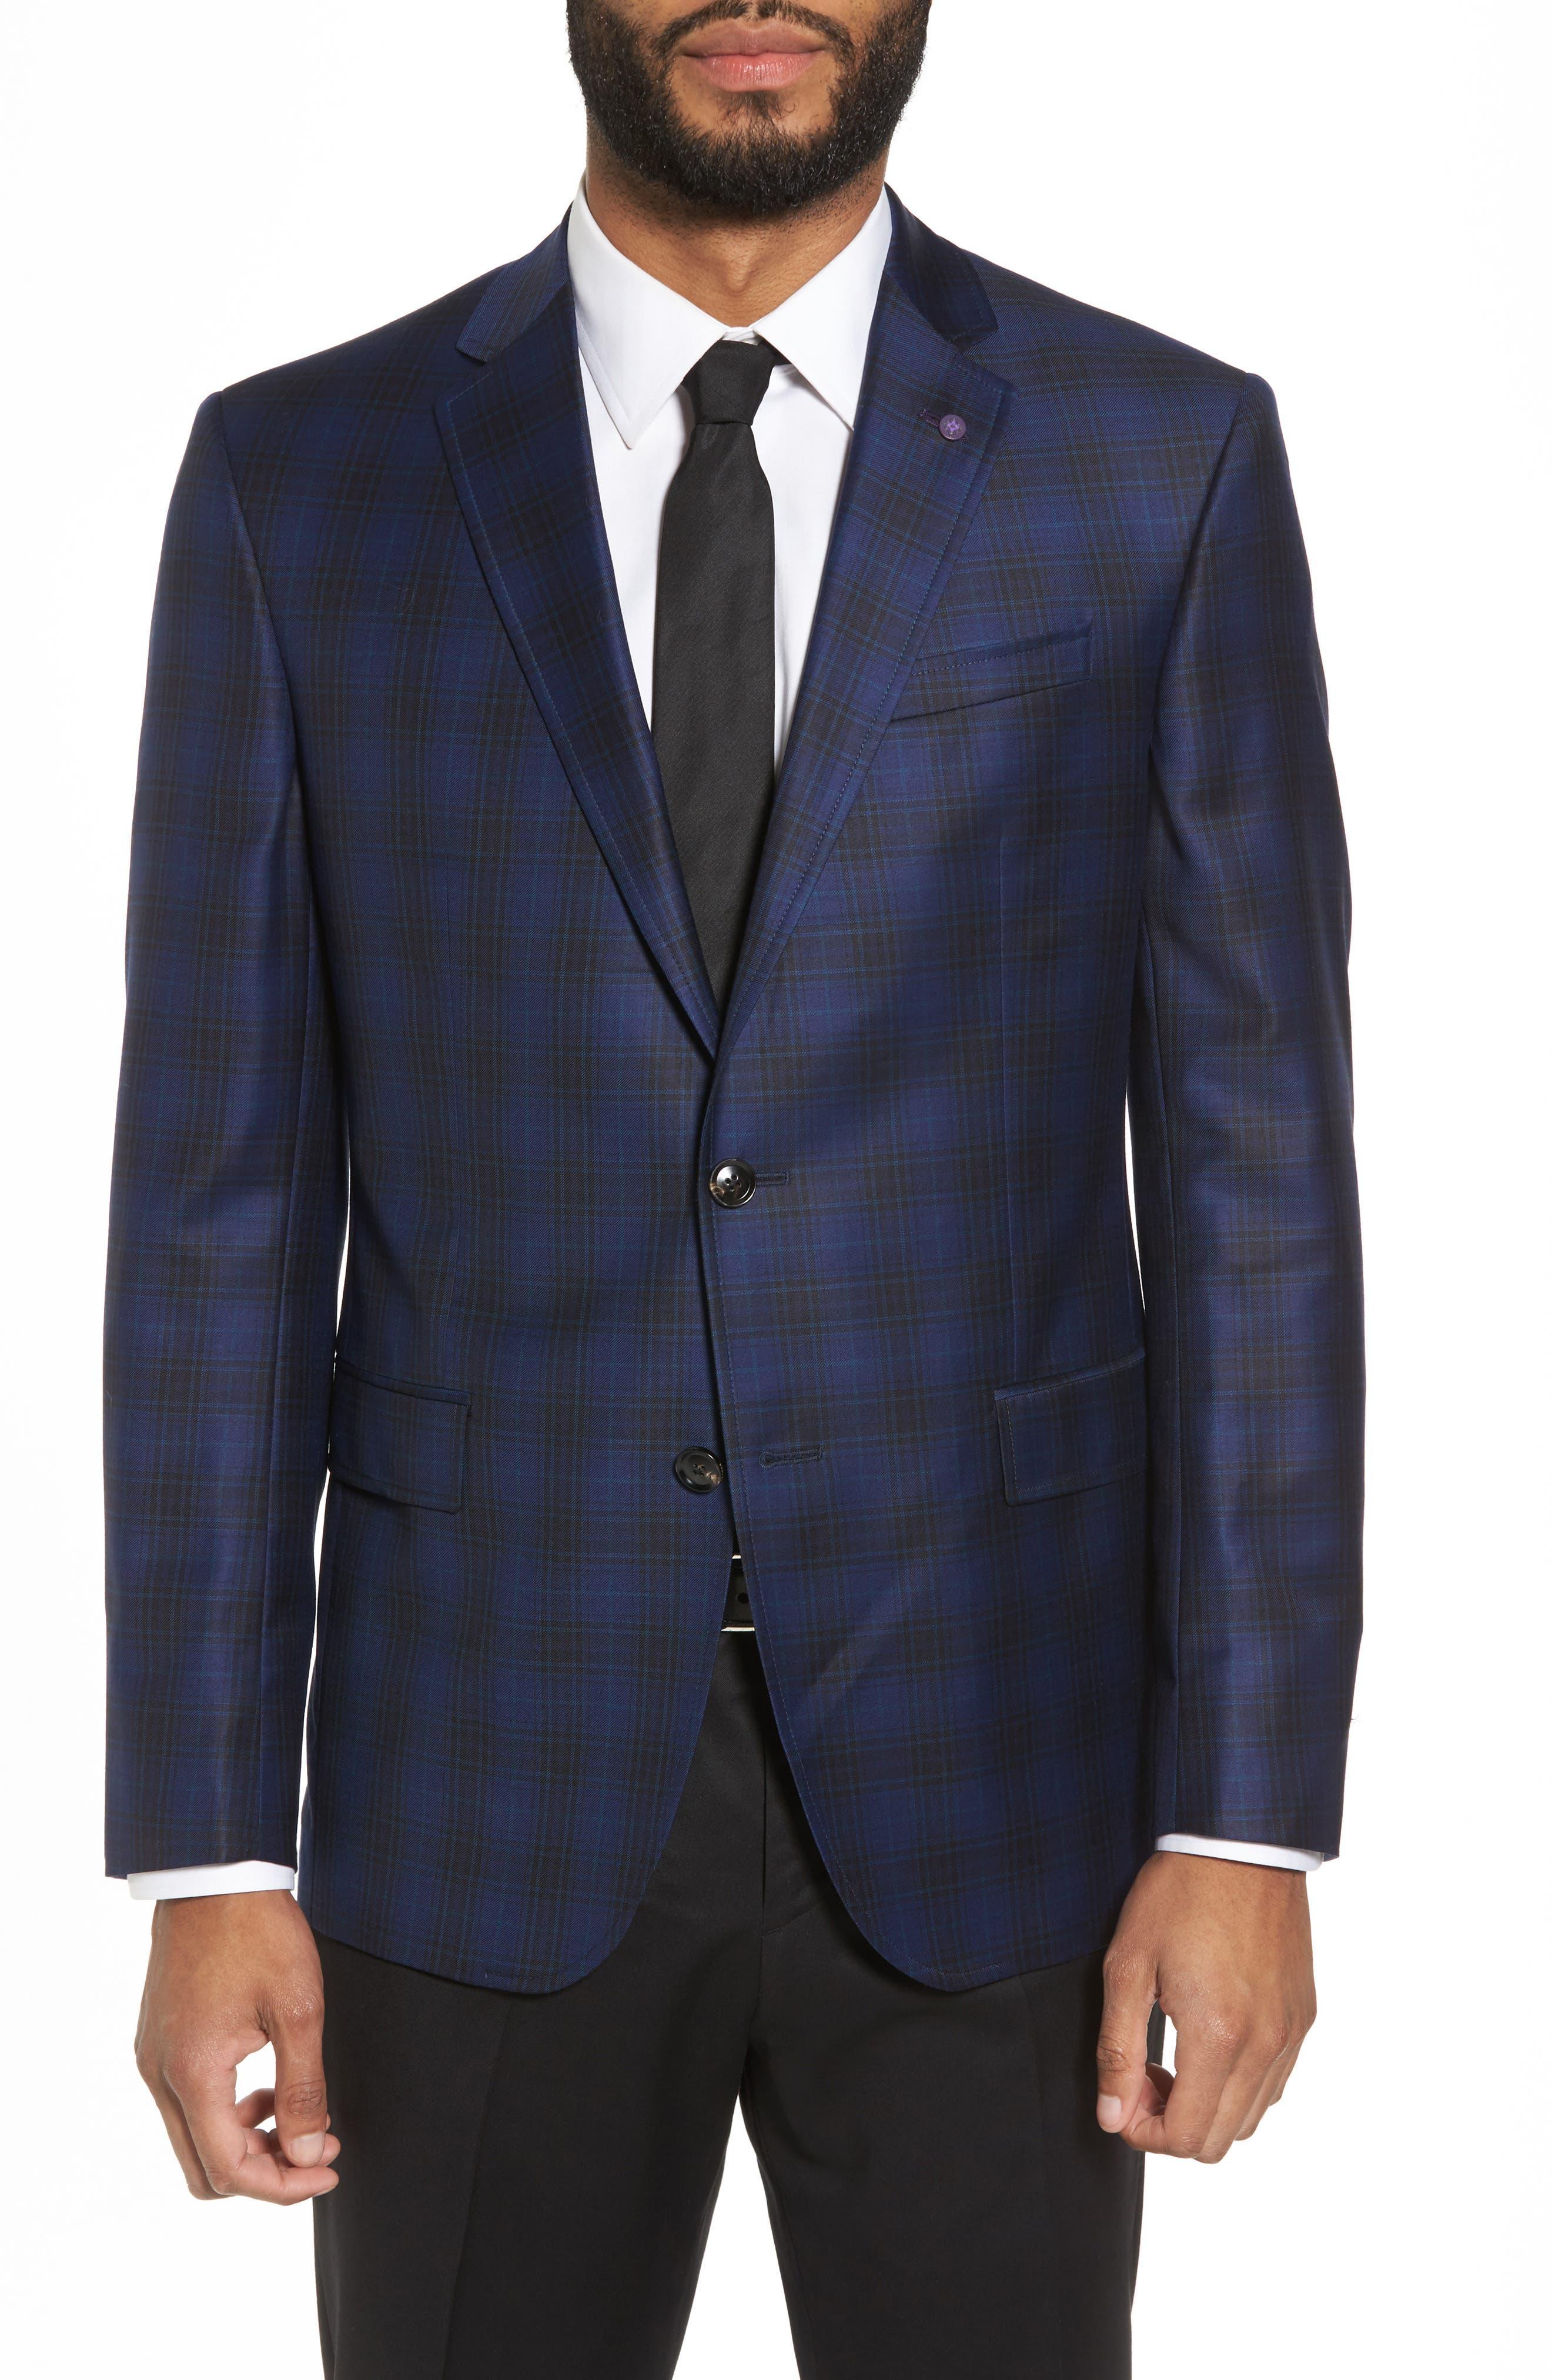 Jay Trim Fit Plaid Wool Sport Coat,                         Main,                         color, Navy